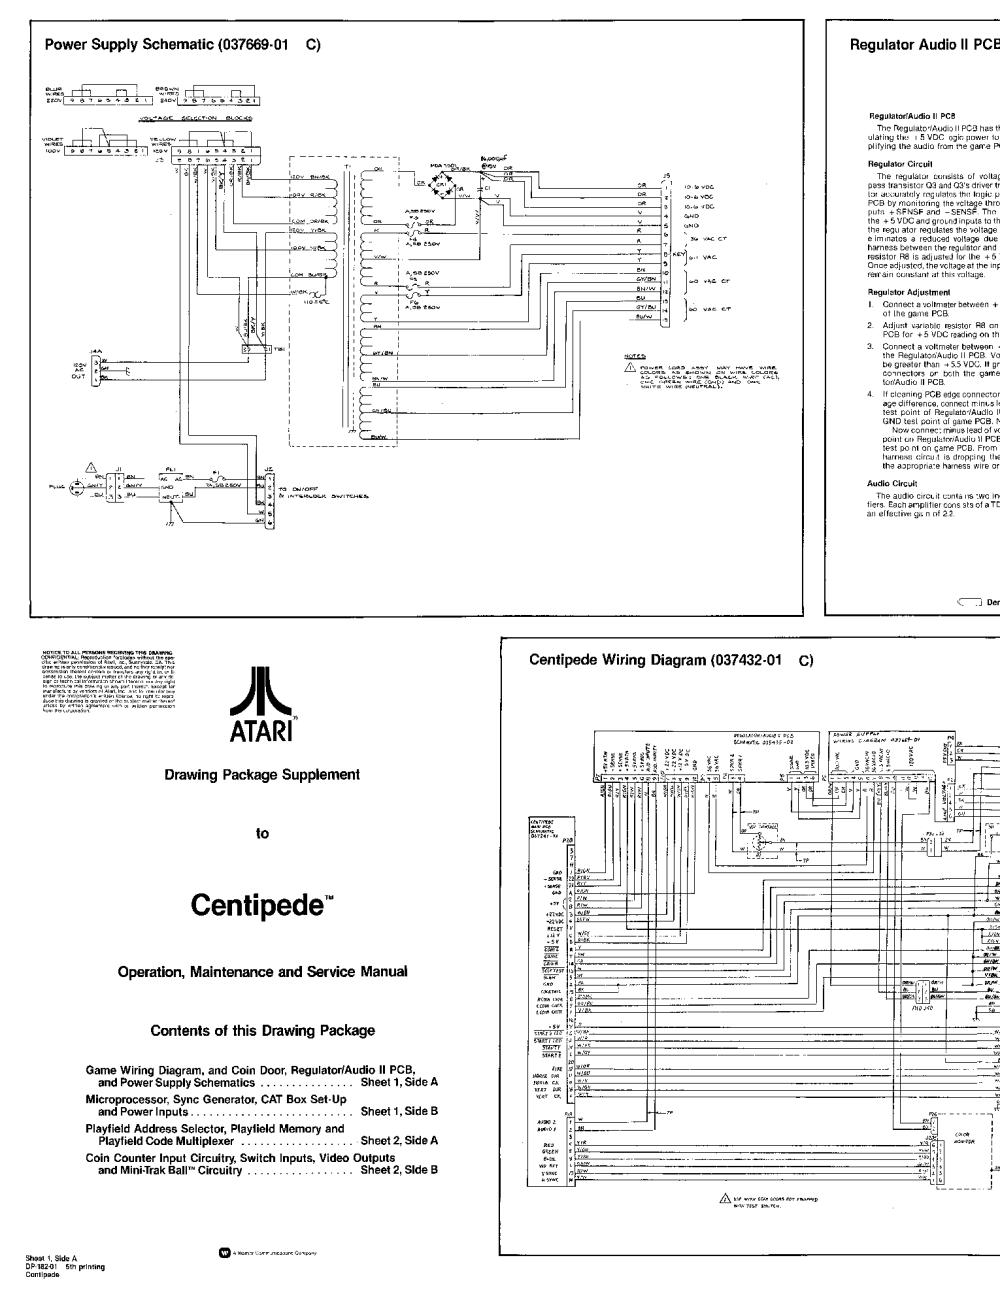 medium resolution of atari centipede sch service manual 1st page